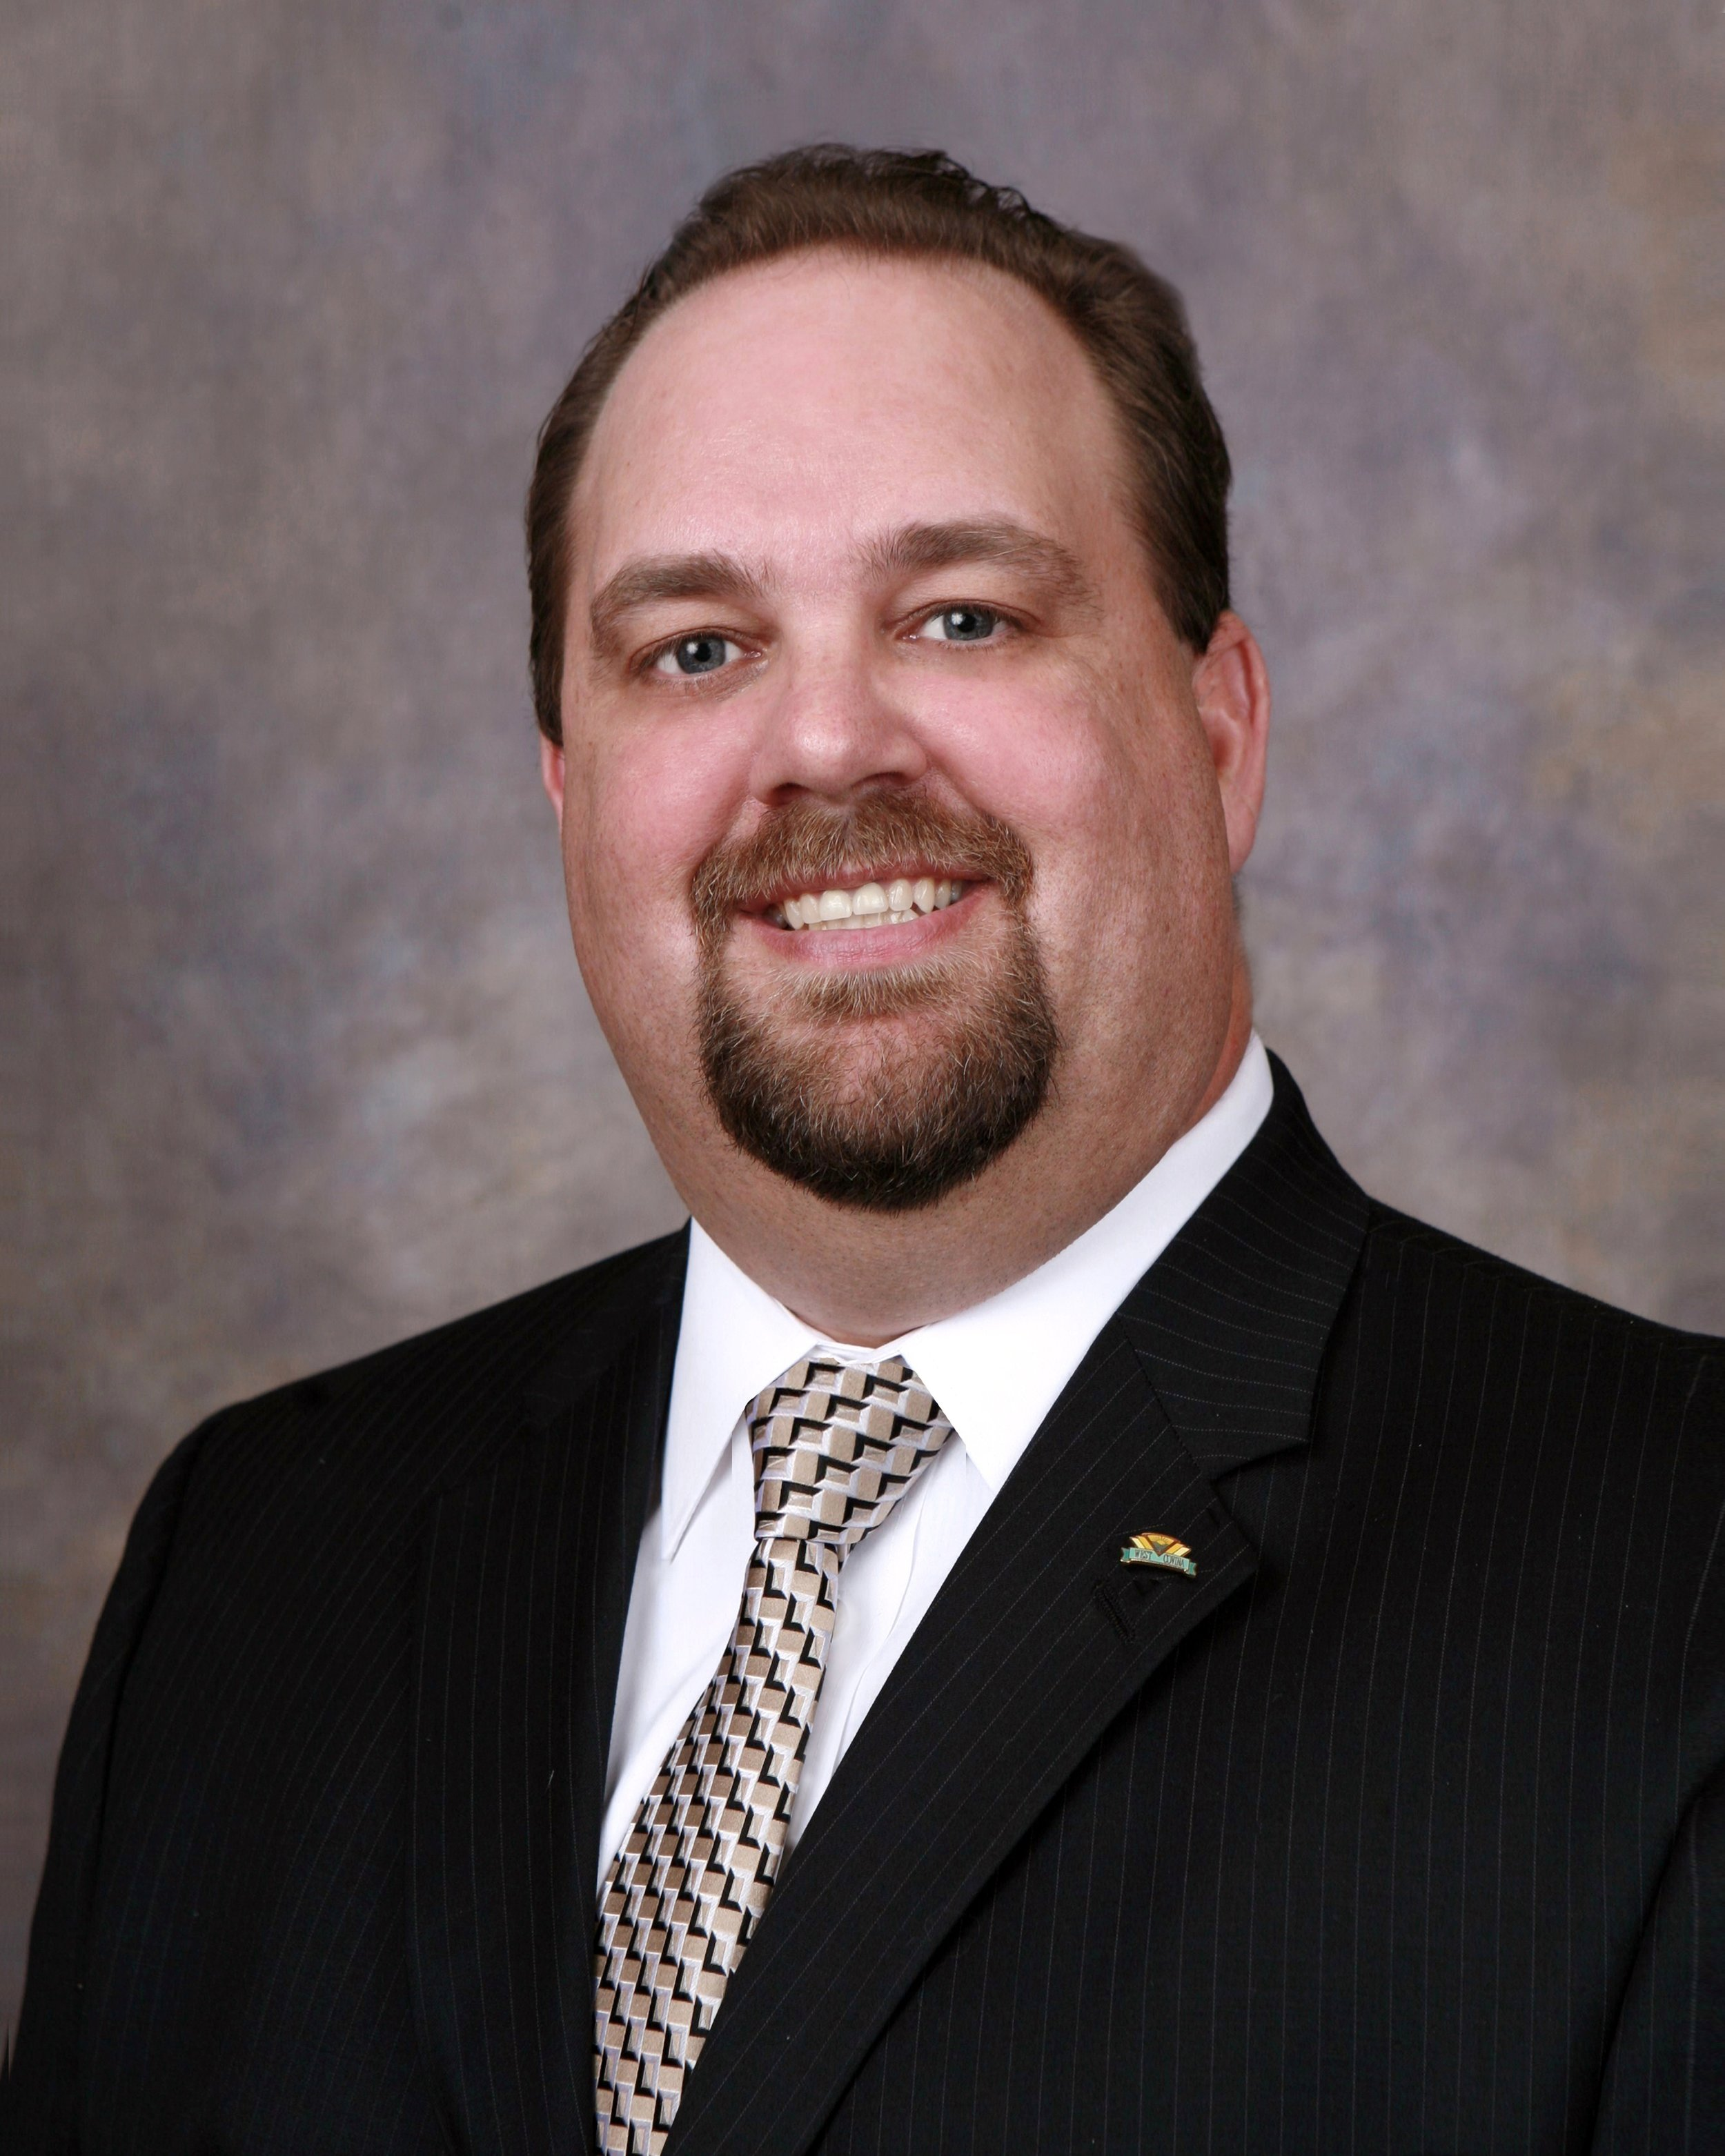 West Covina City Manager Chris Freeland